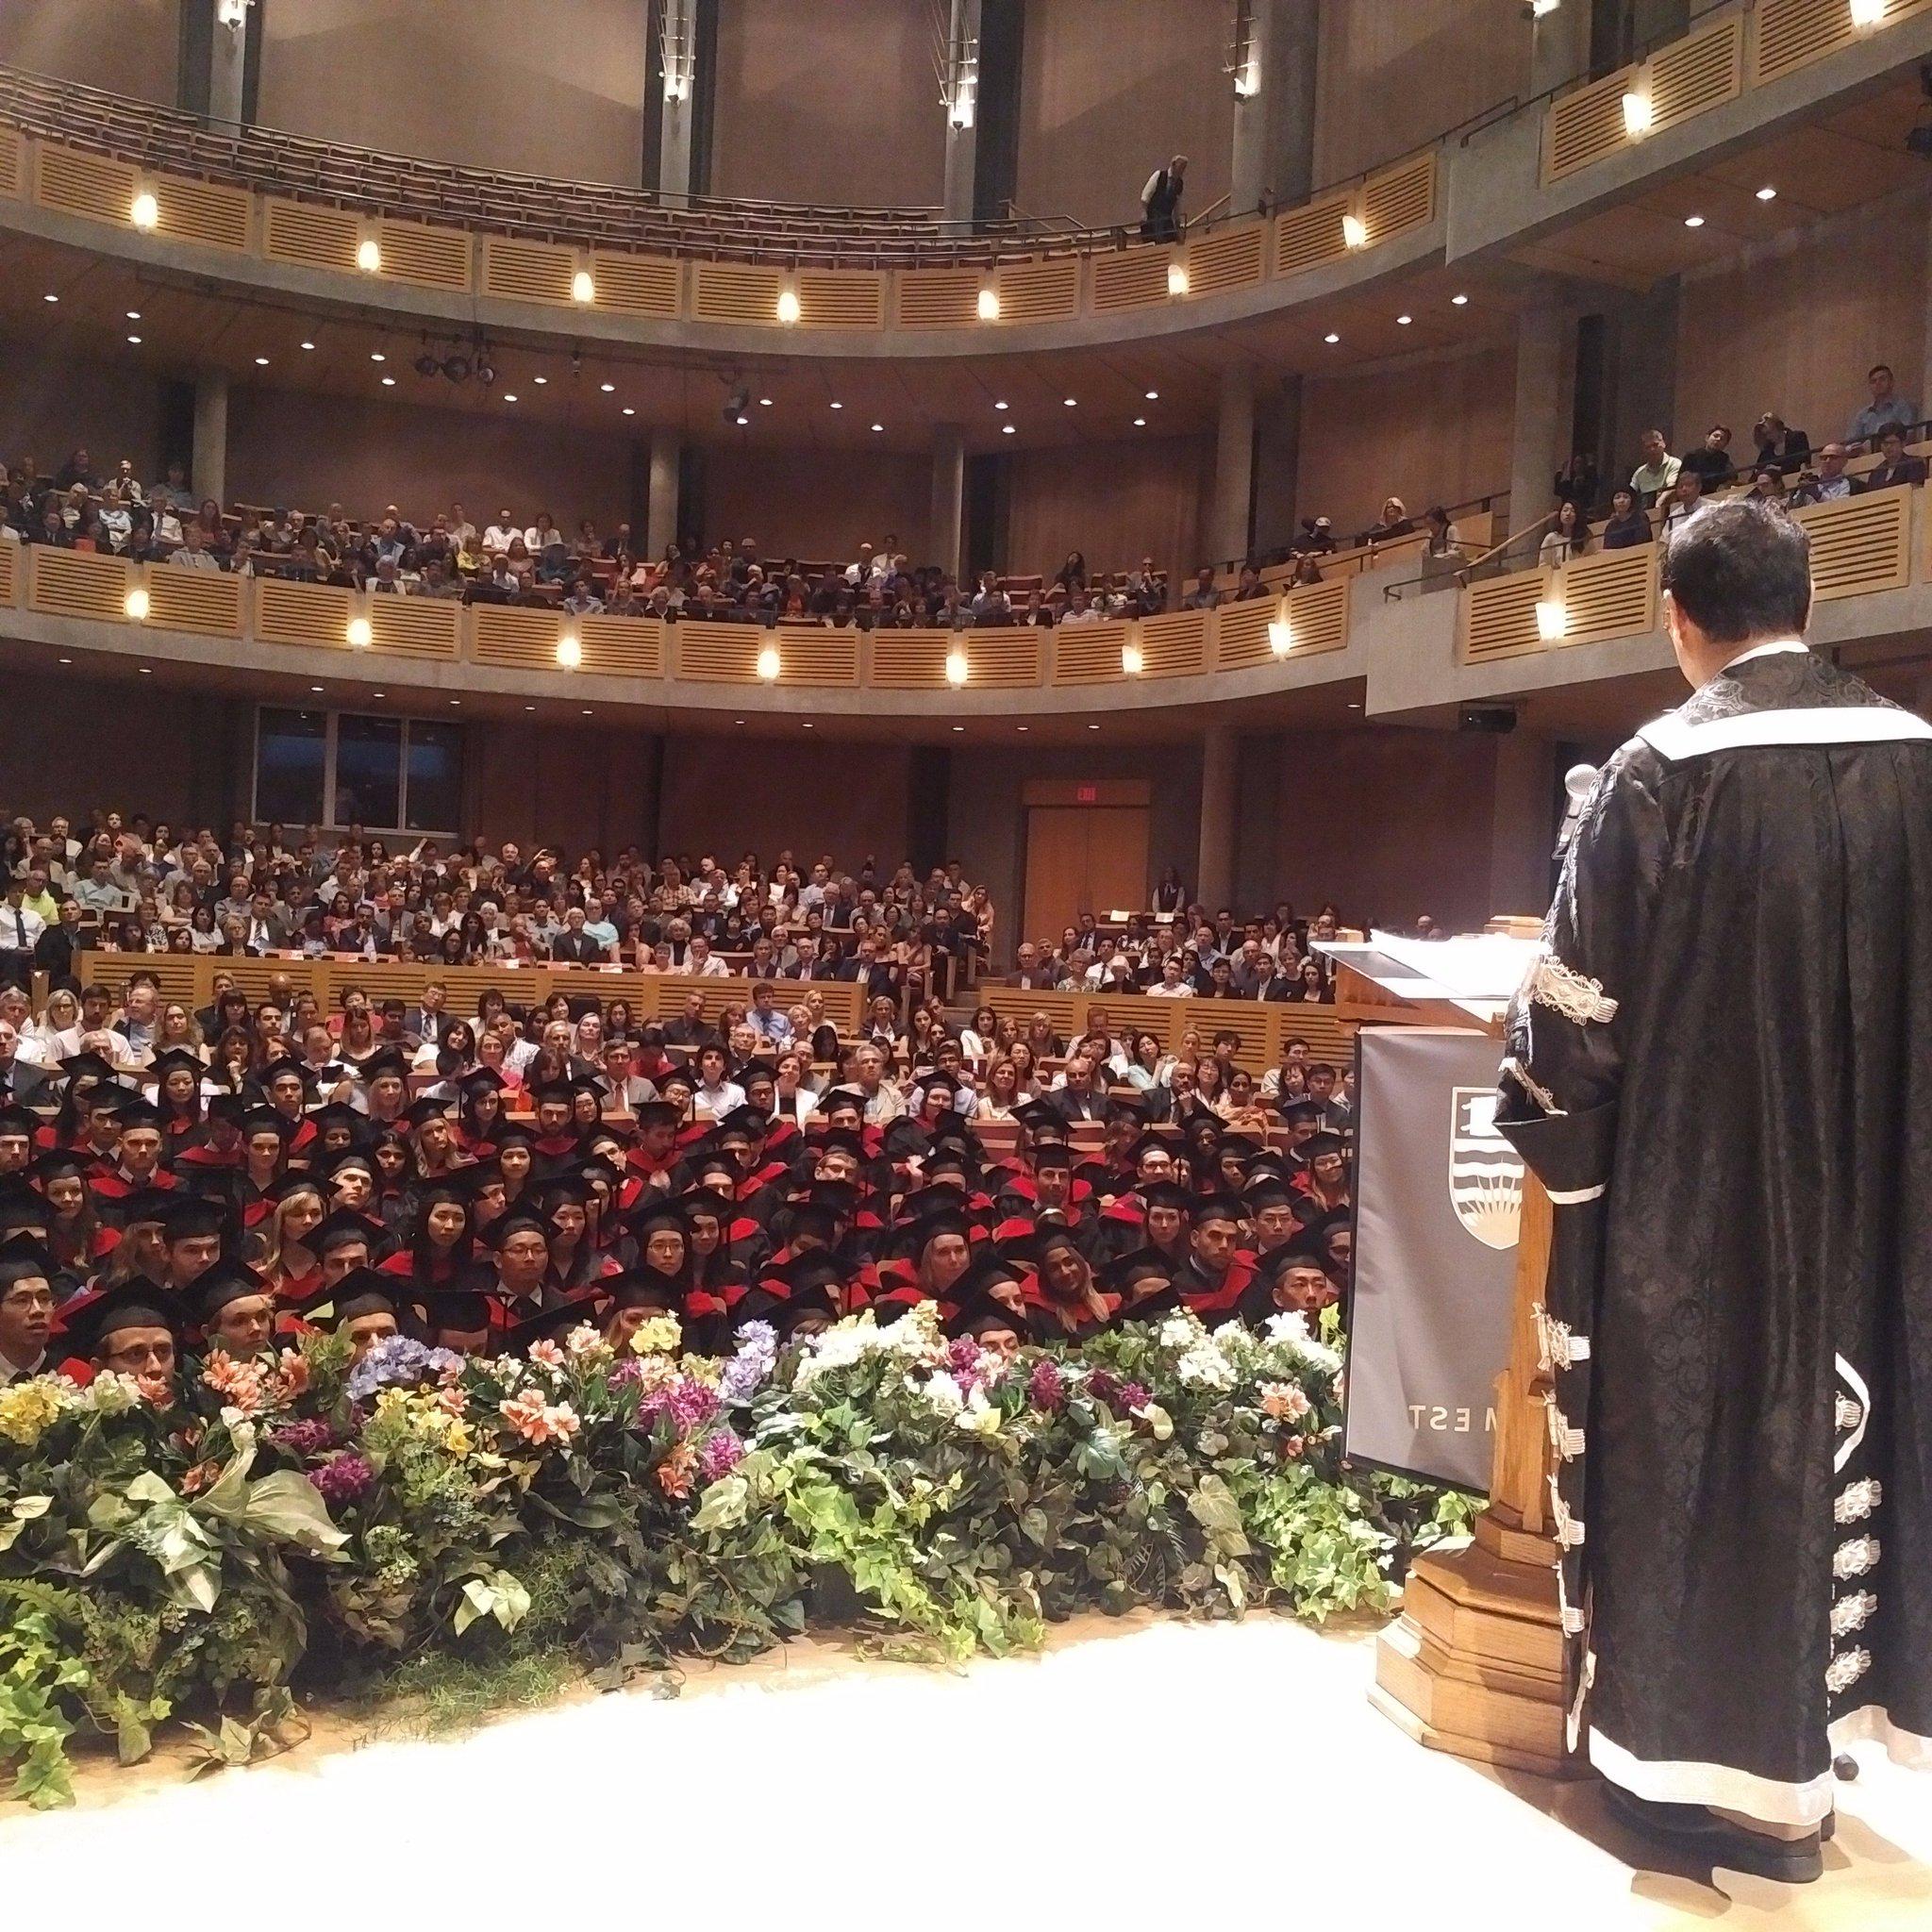 View from the President's podium. @ubcprez gives inspiring speech to @UBC graduates today @UBCmedicine #UBCGrad #UBclassof2017 #UBCFOM2017 https://t.co/RH71nshTj7